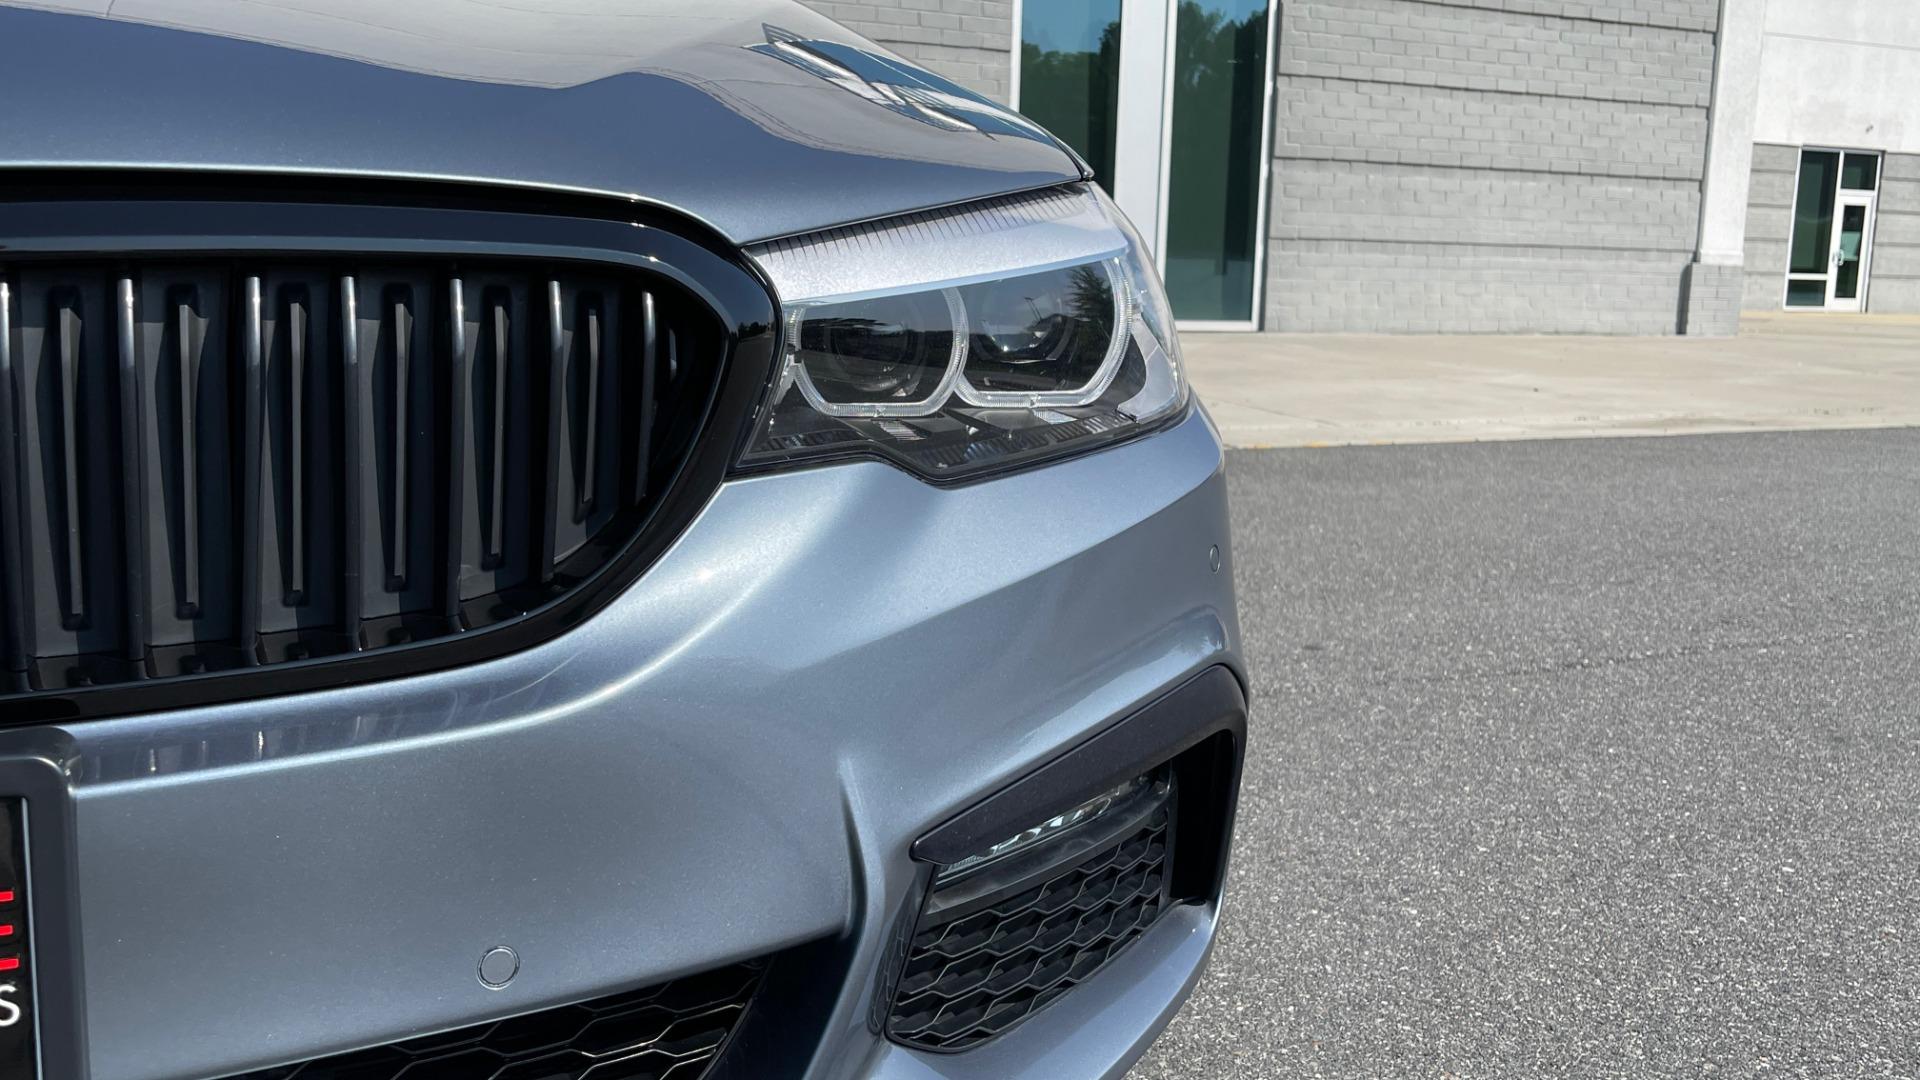 Used 2018 BMW 5 SERIES 540I XDRIVE M-SPORT / DRVR ASST / PDC / APPLE / HUD / H/K SND for sale $42,795 at Formula Imports in Charlotte NC 28227 13